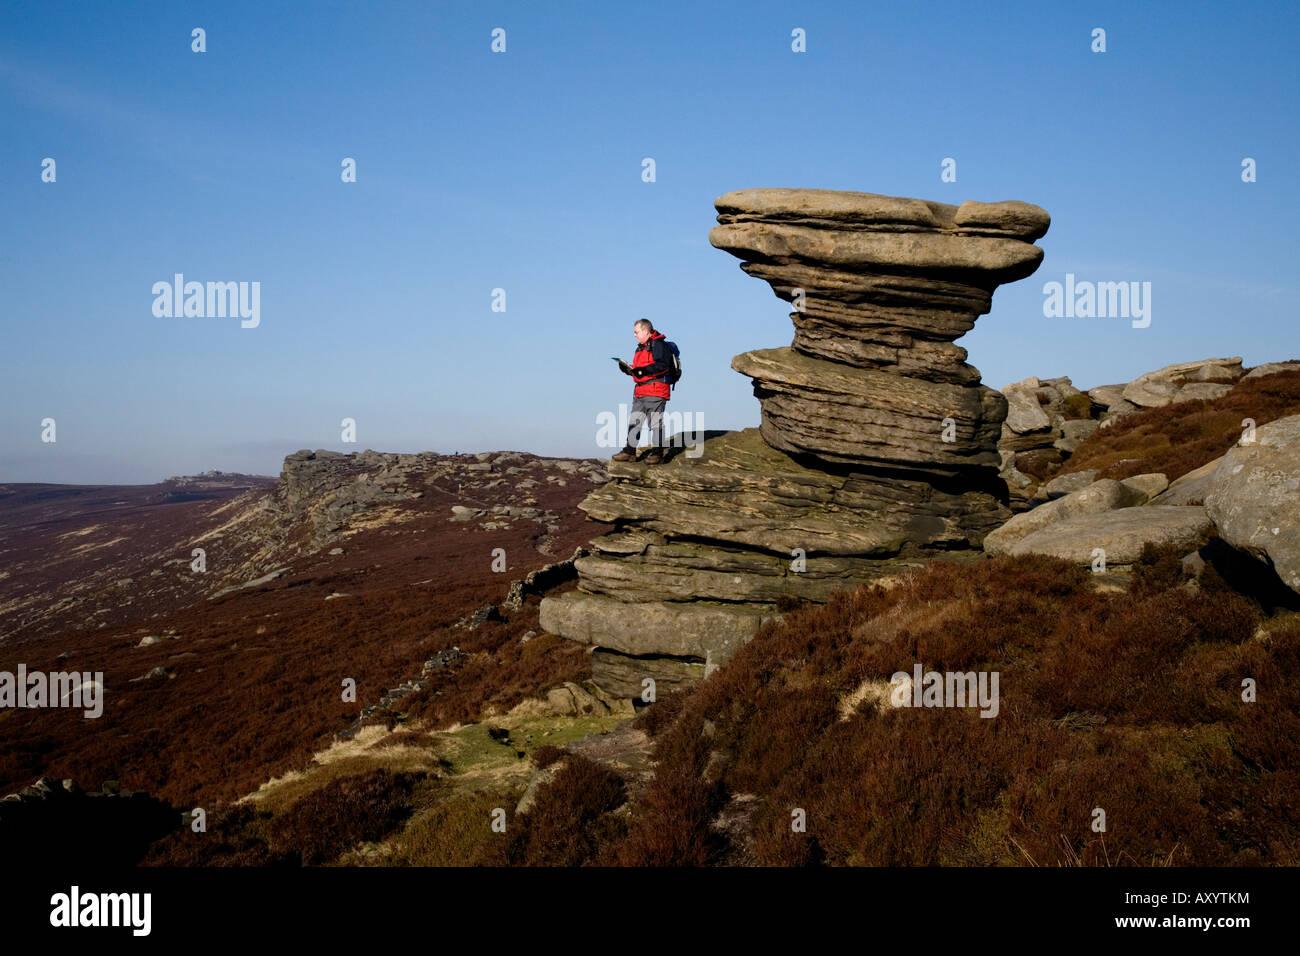 A walker standing upon the Salt Cellar on Derwent Edge in Derbyshire. - Stock Image